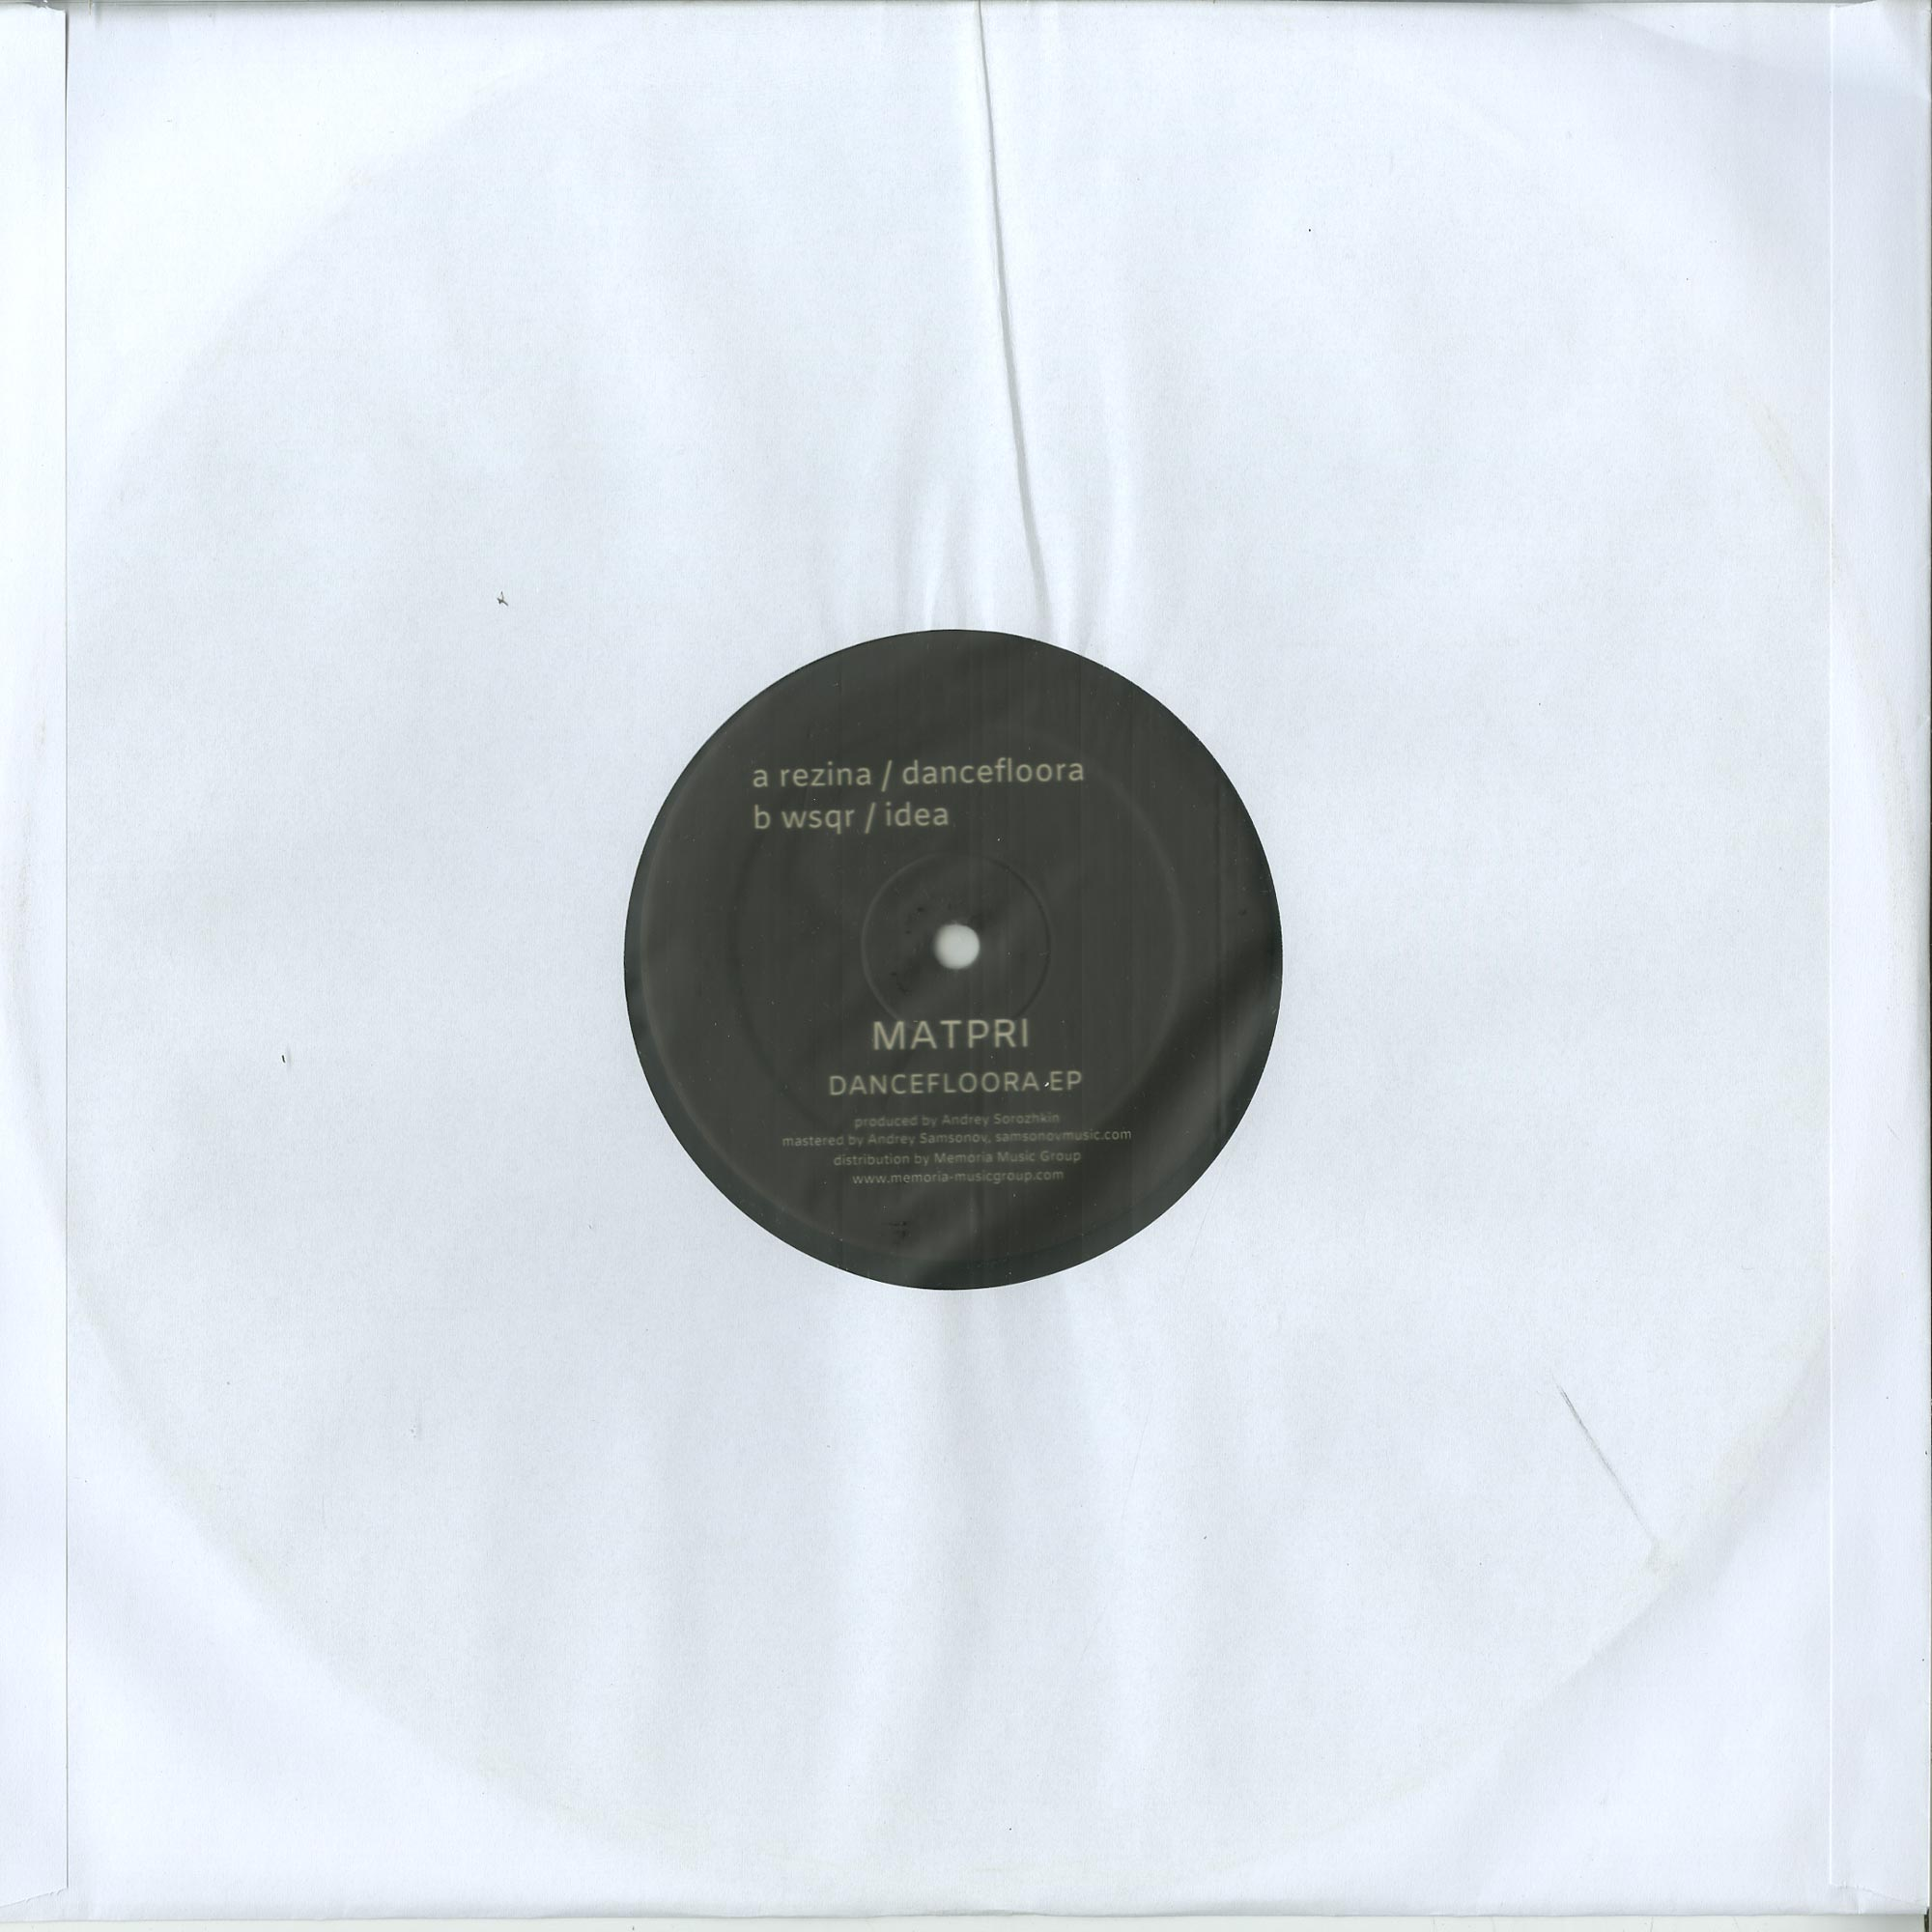 Matpri - DANCEFLOORA EP